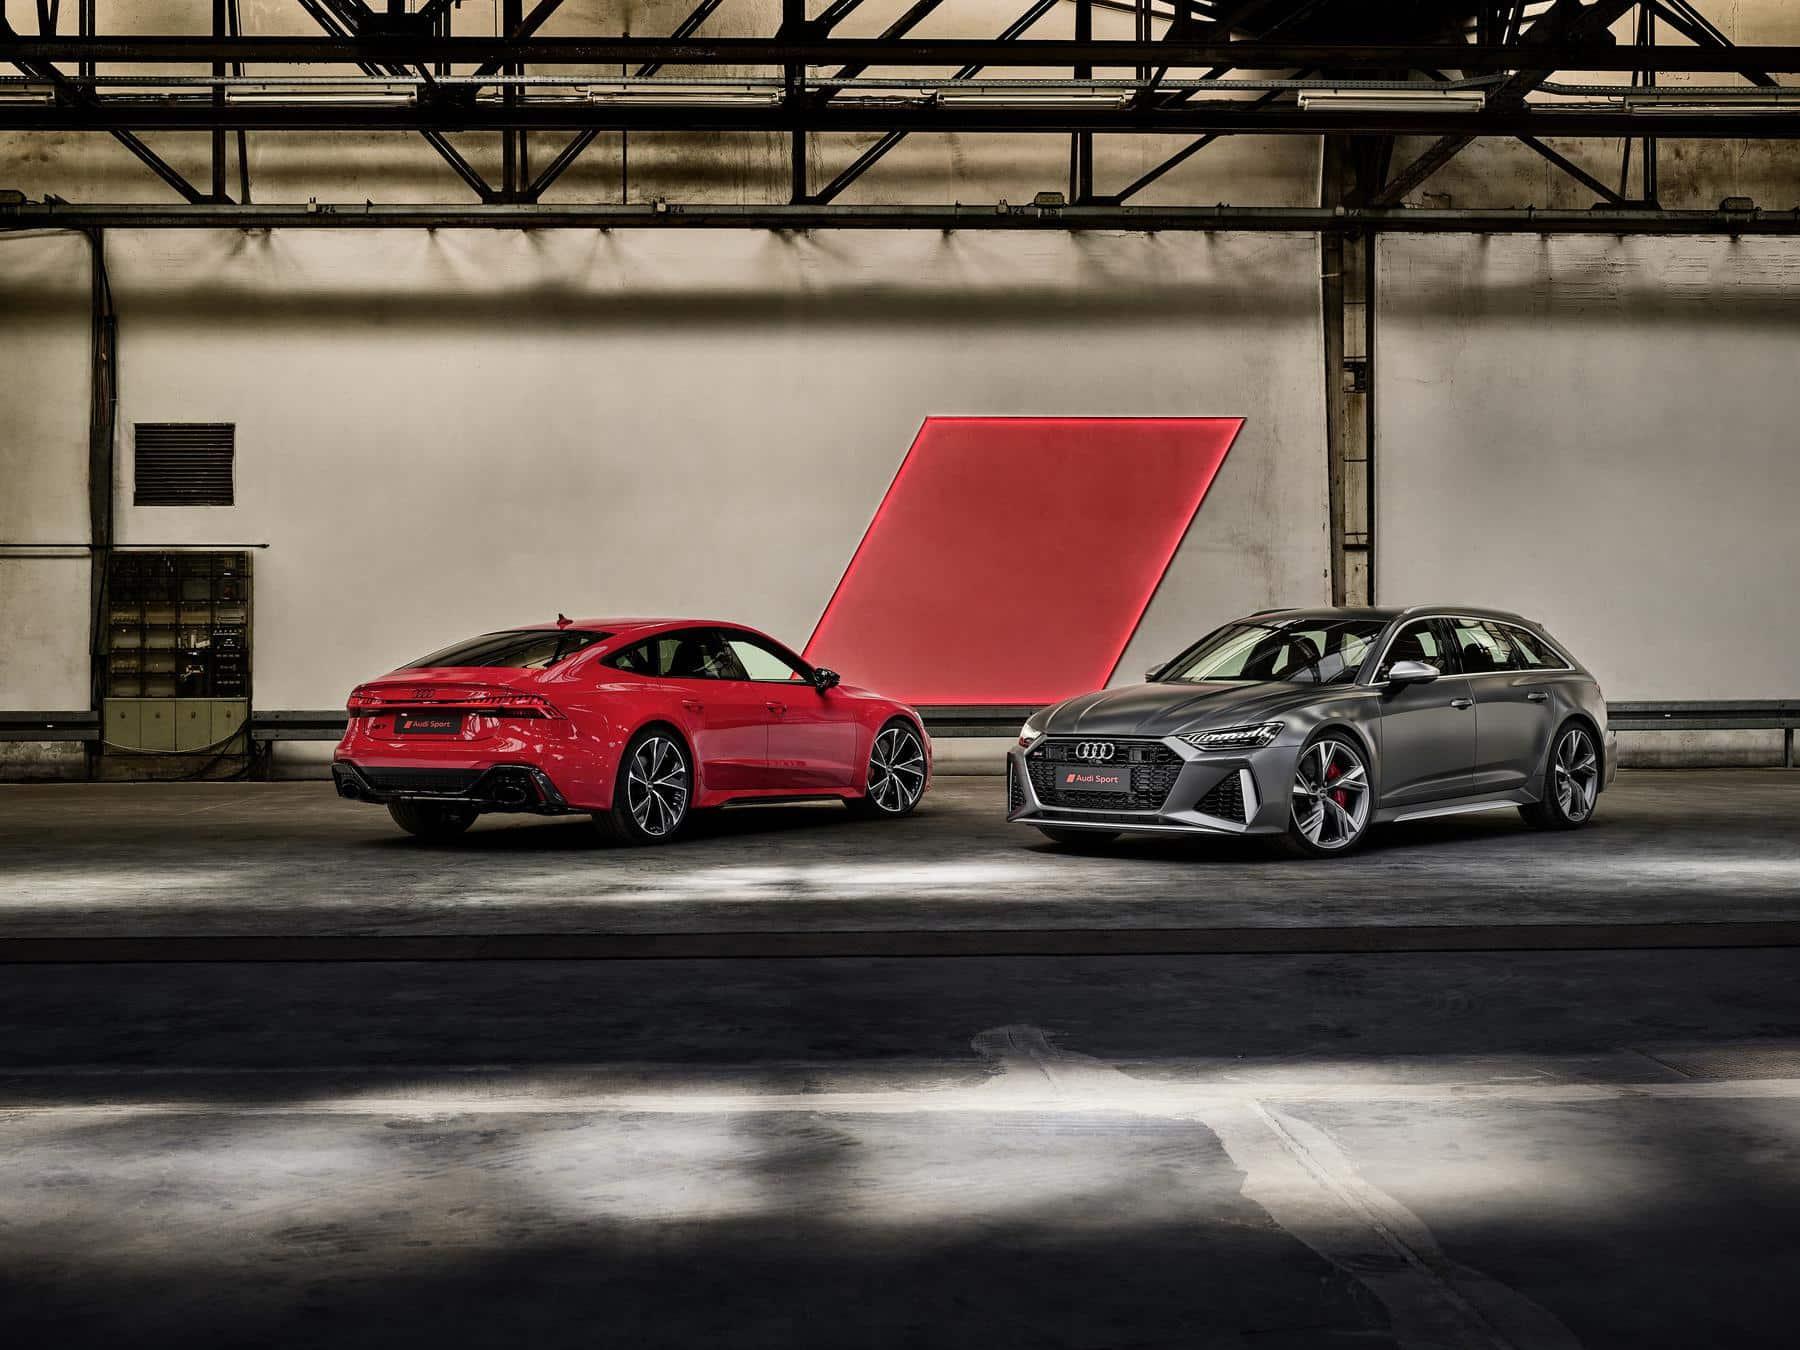 Audi Audi RS6 Avant and RS7 Sportback